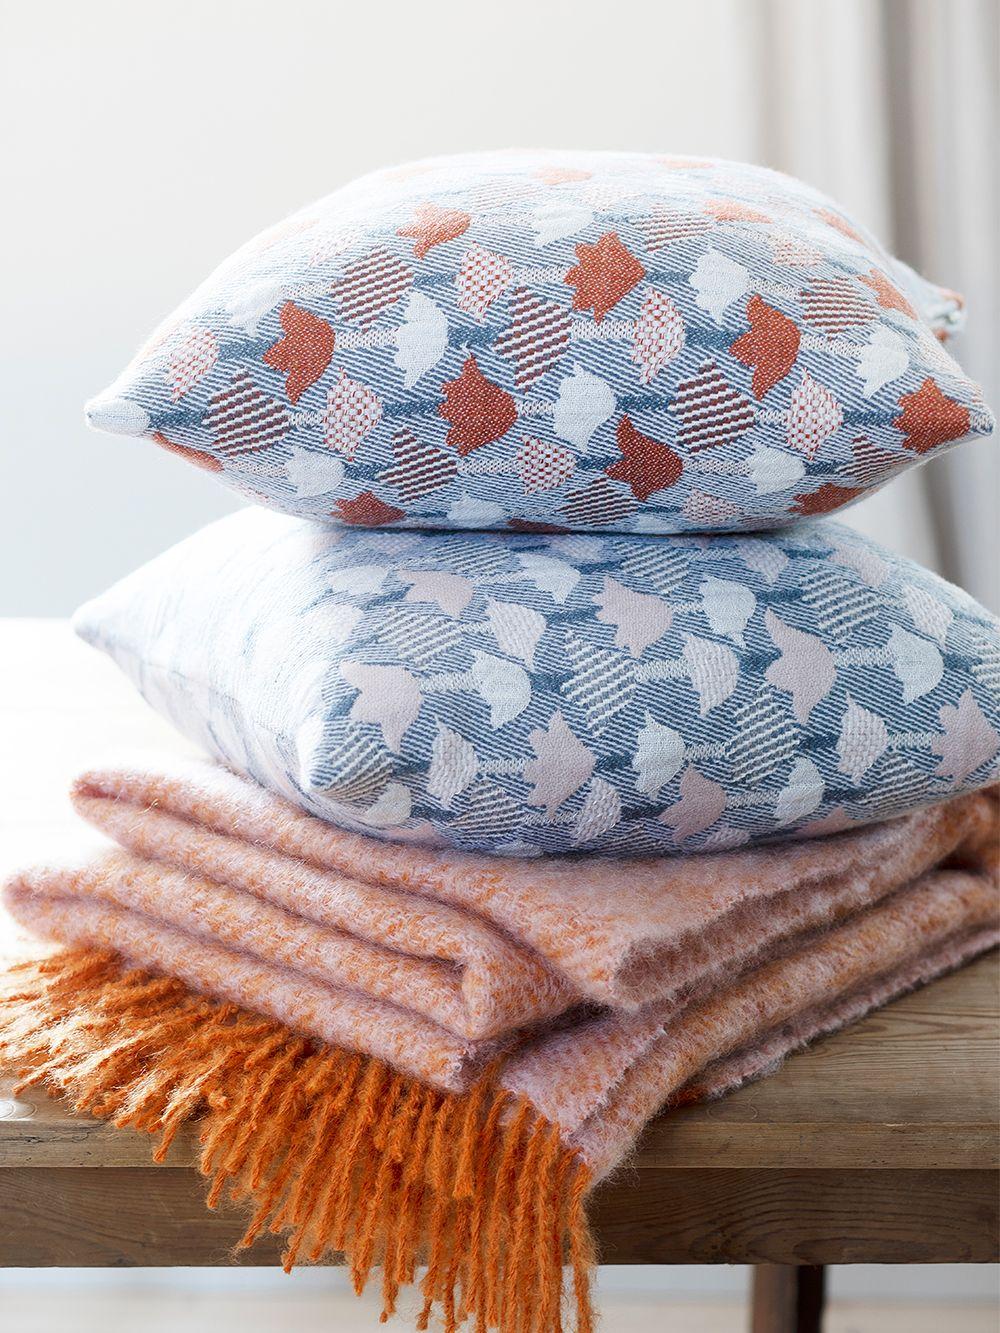 Tulppaani cushion cover by Lapuan Kankurit